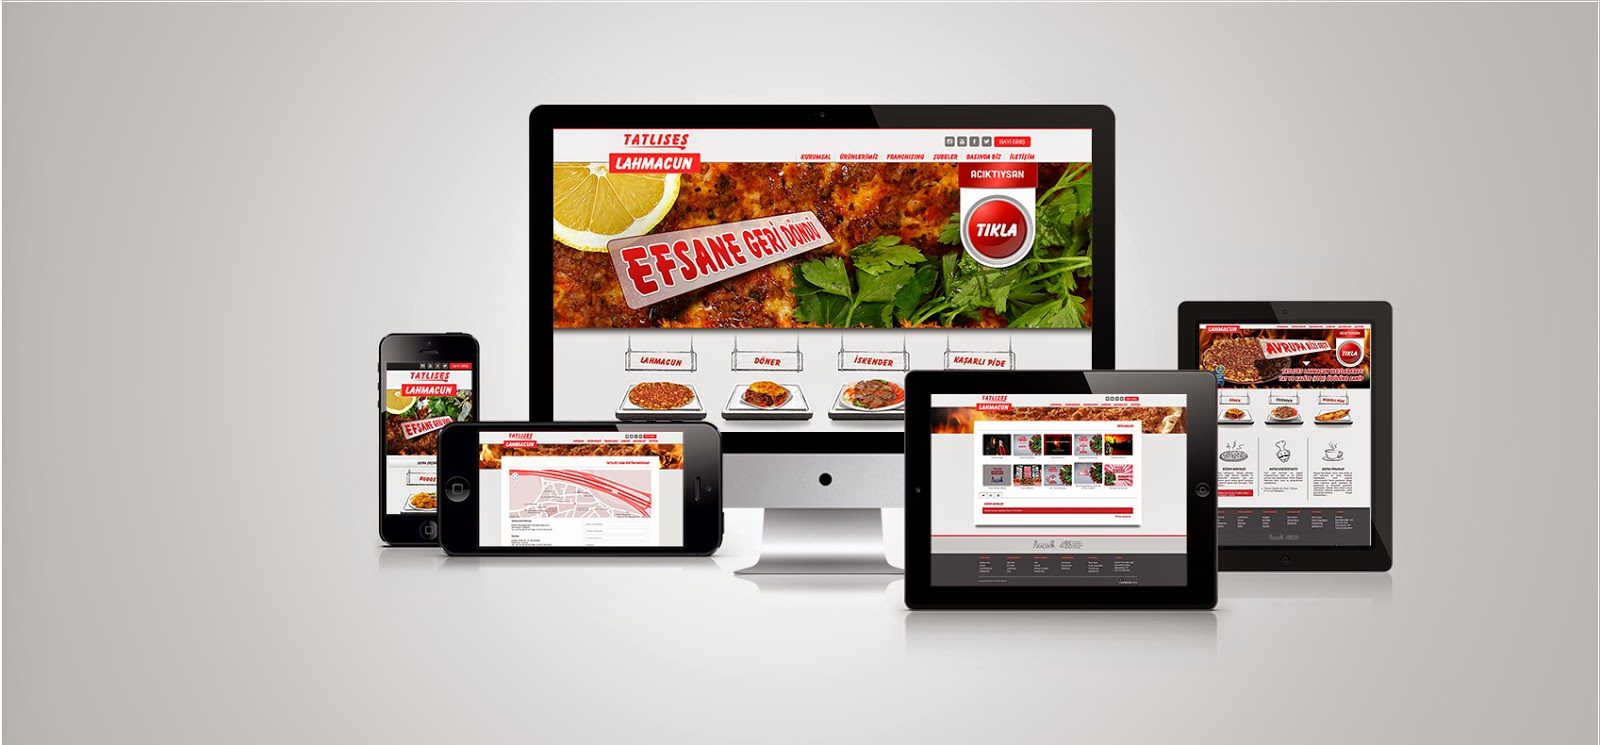 Tatlıses Lahmacun Web Tasarım - Responsive Design